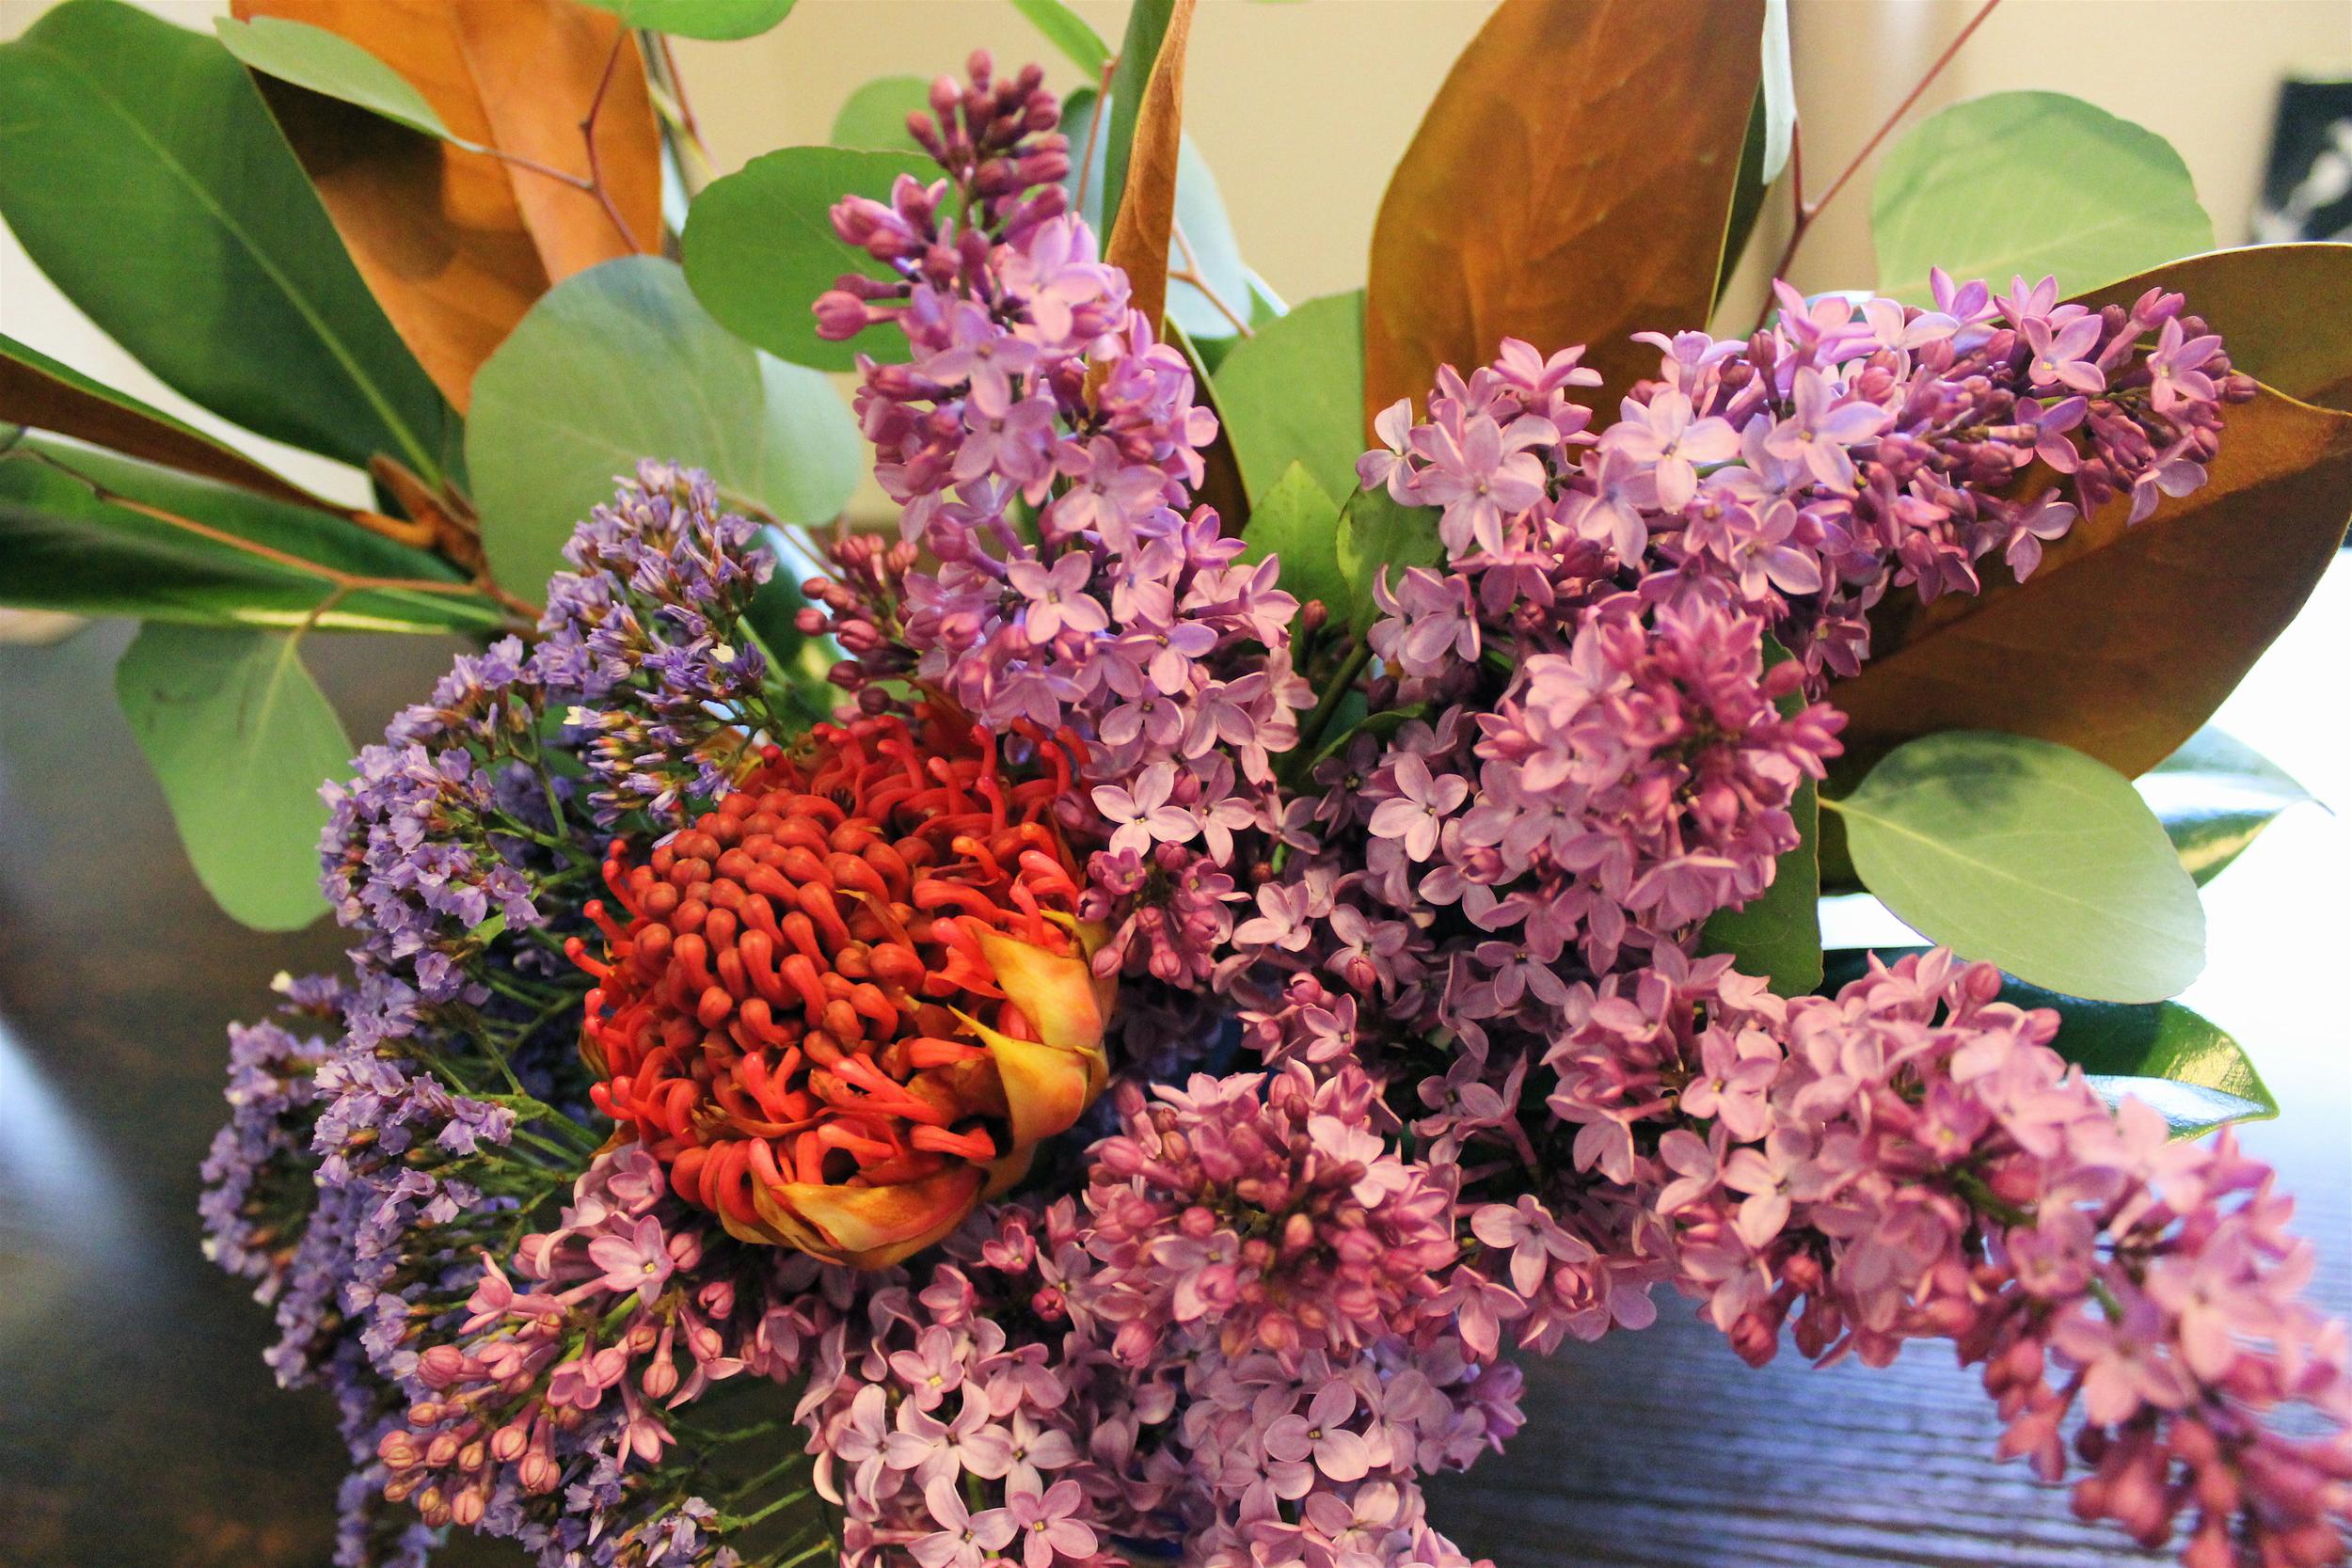 Magnolia, protea, & lilac...oh my.